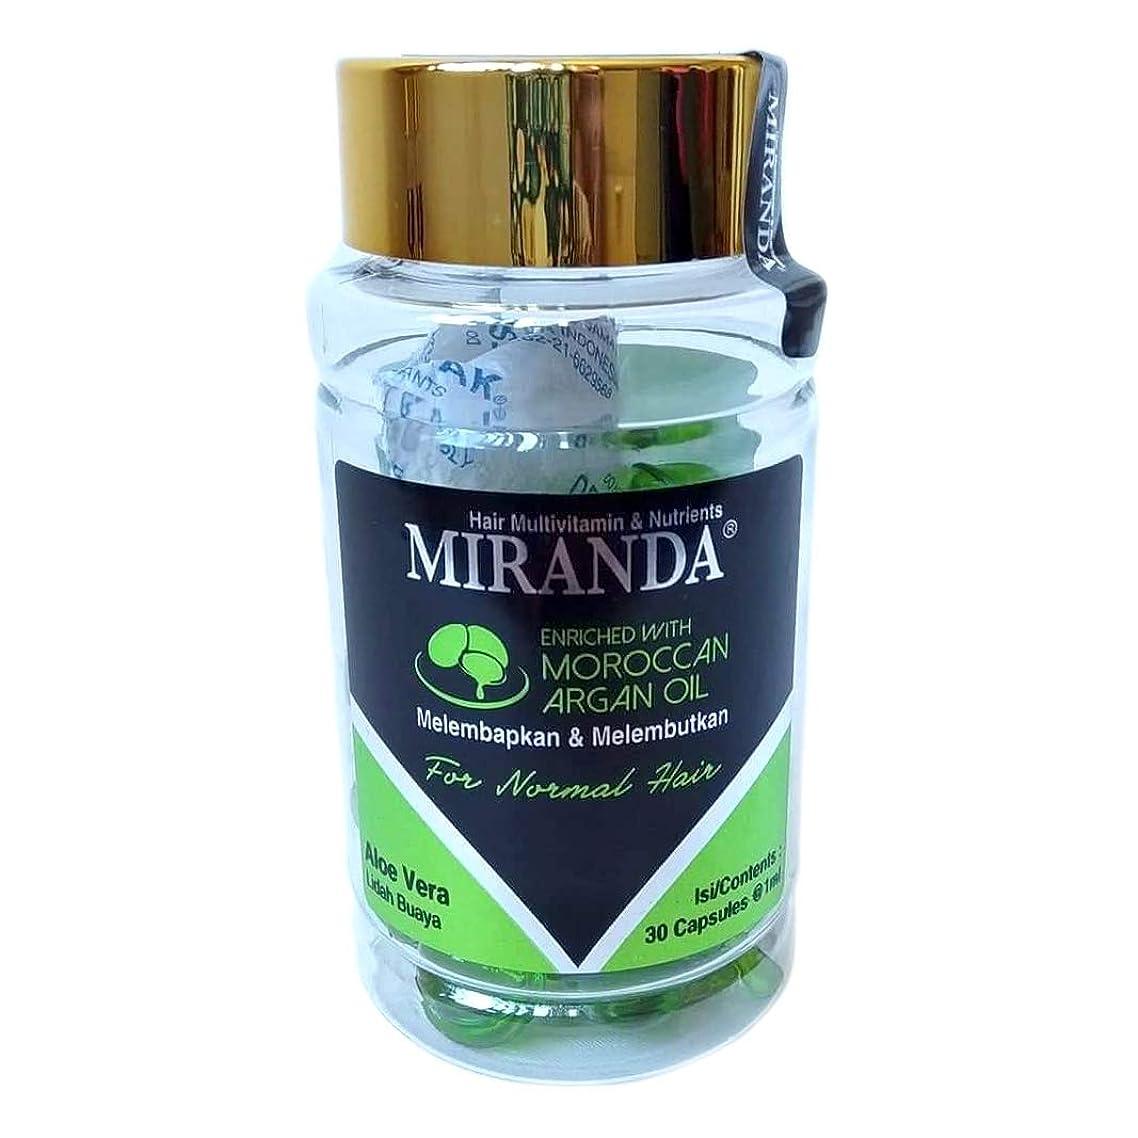 MIRANDA ミランダ Hair Multivitamin&Nutrients ヘアマルチビタミン ニュートリエンツ 洗い流さないヘアトリートメント 30粒入ボトル Aloe vera アロエベラ [海外直送品]